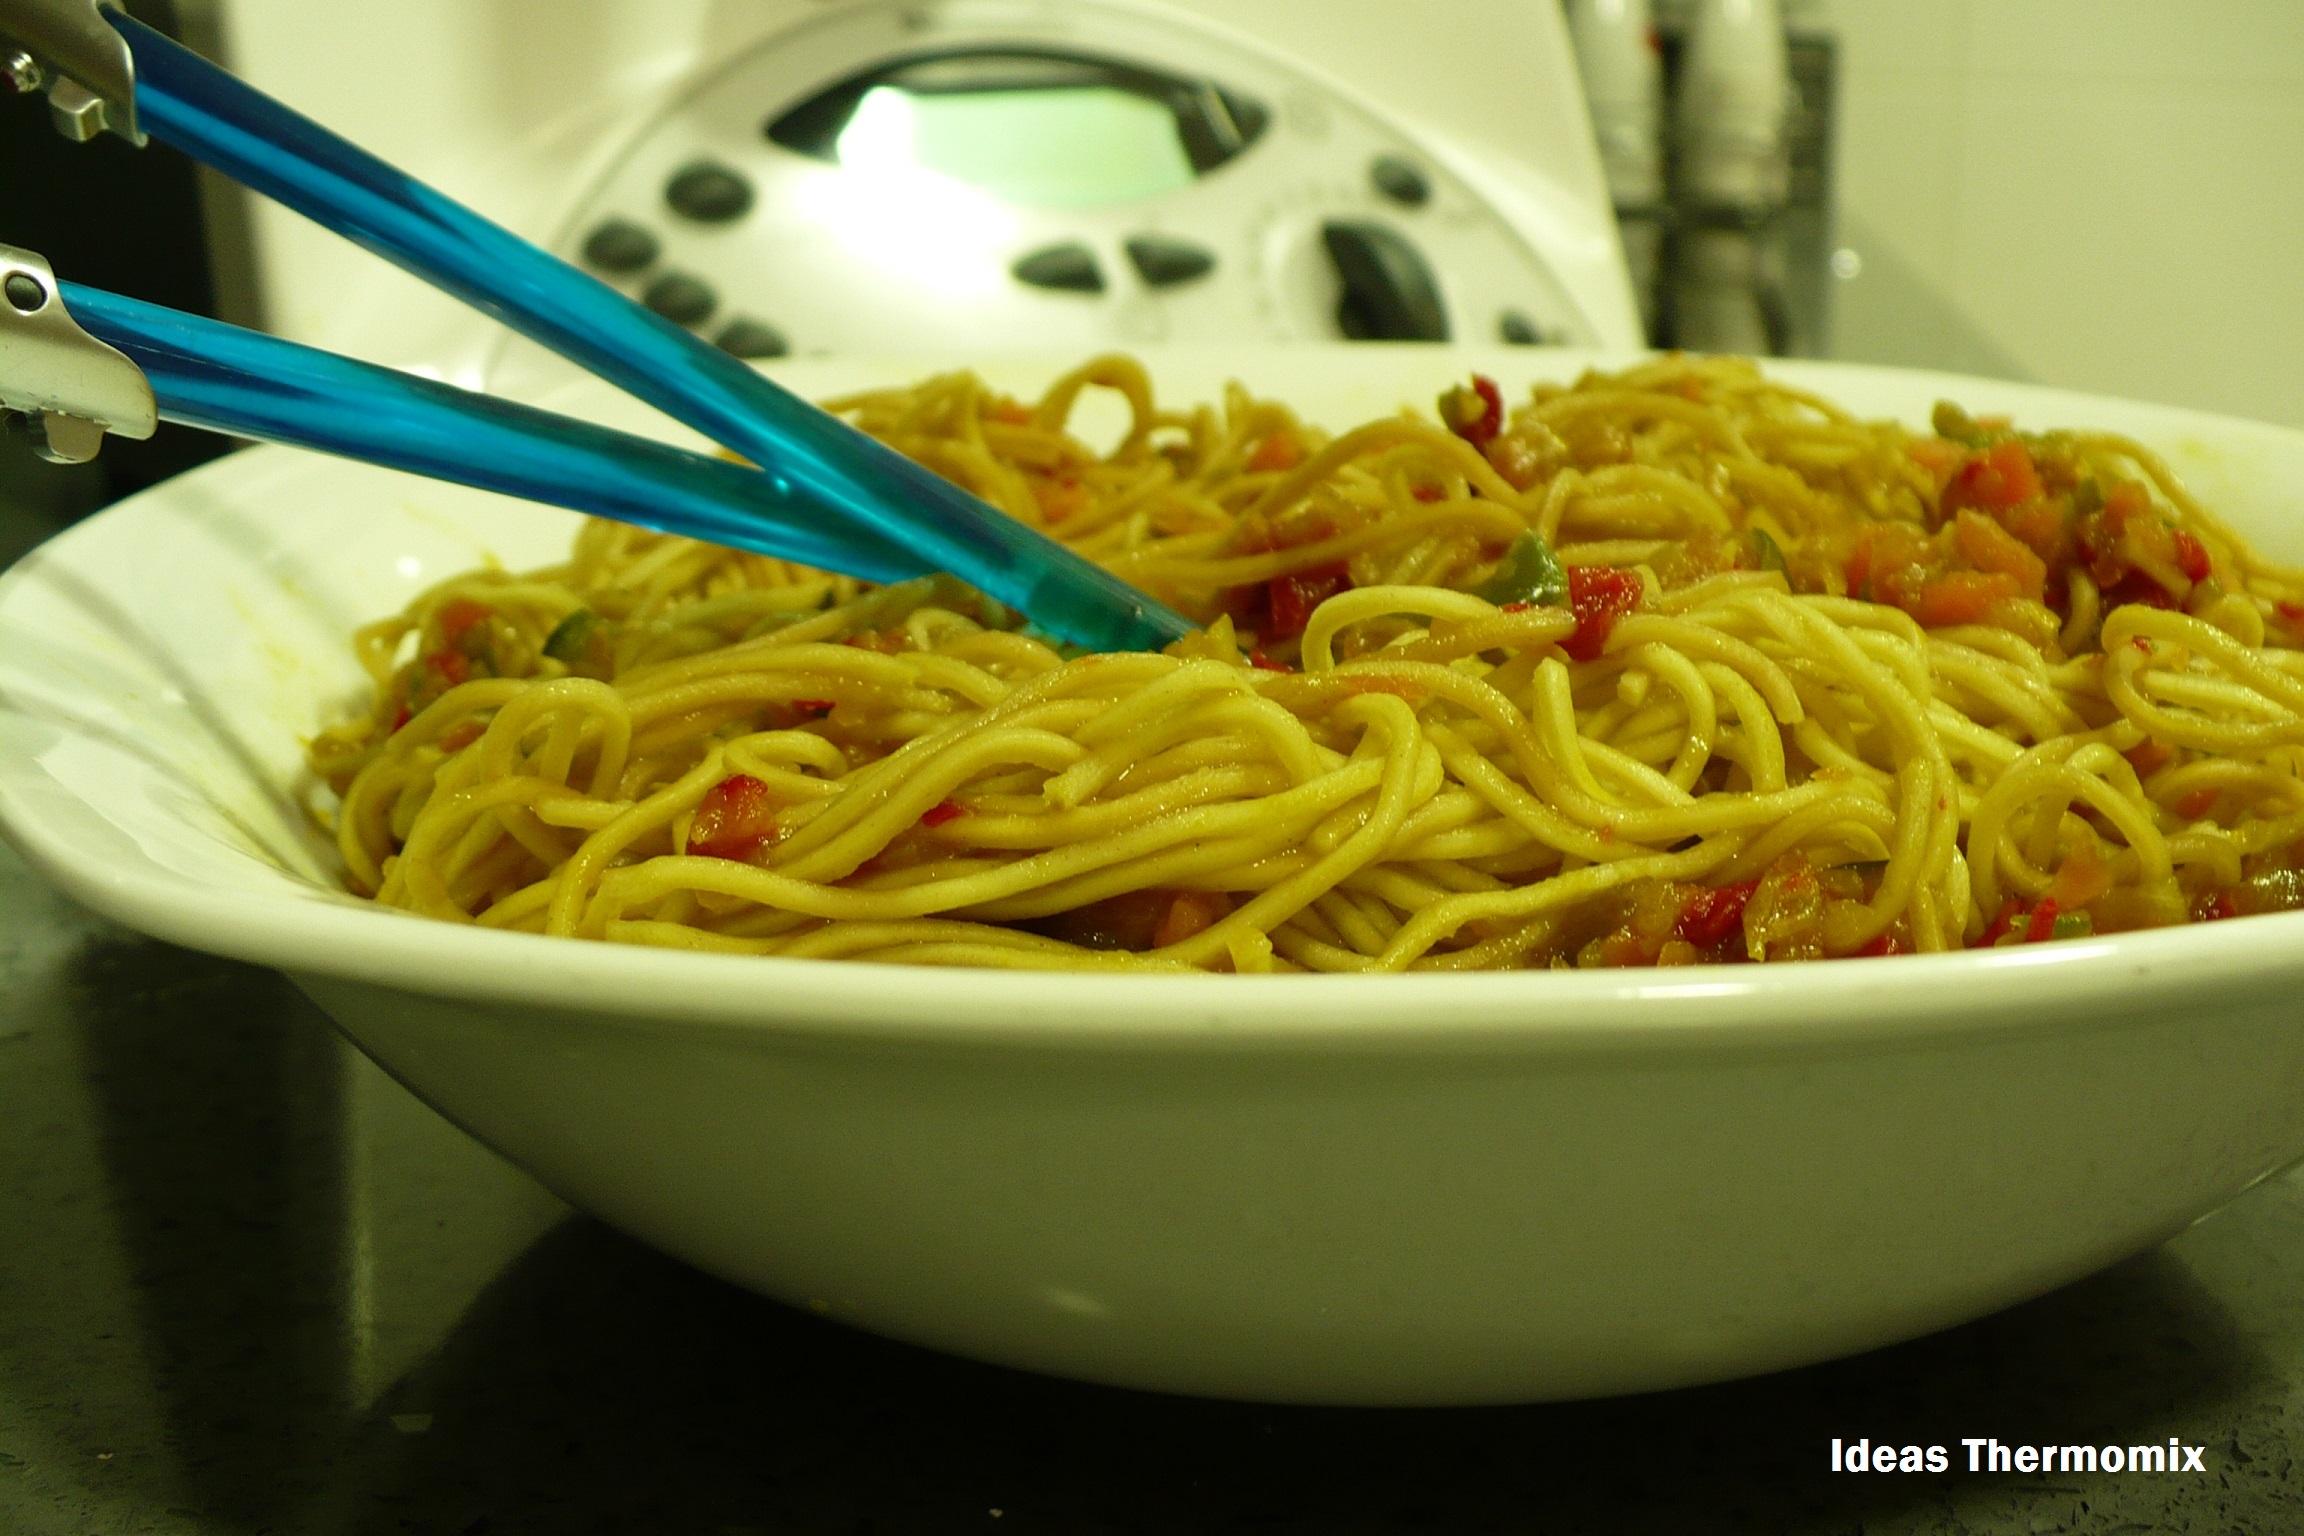 Receta de Fideos Chinos con Verduras con Thermomix®